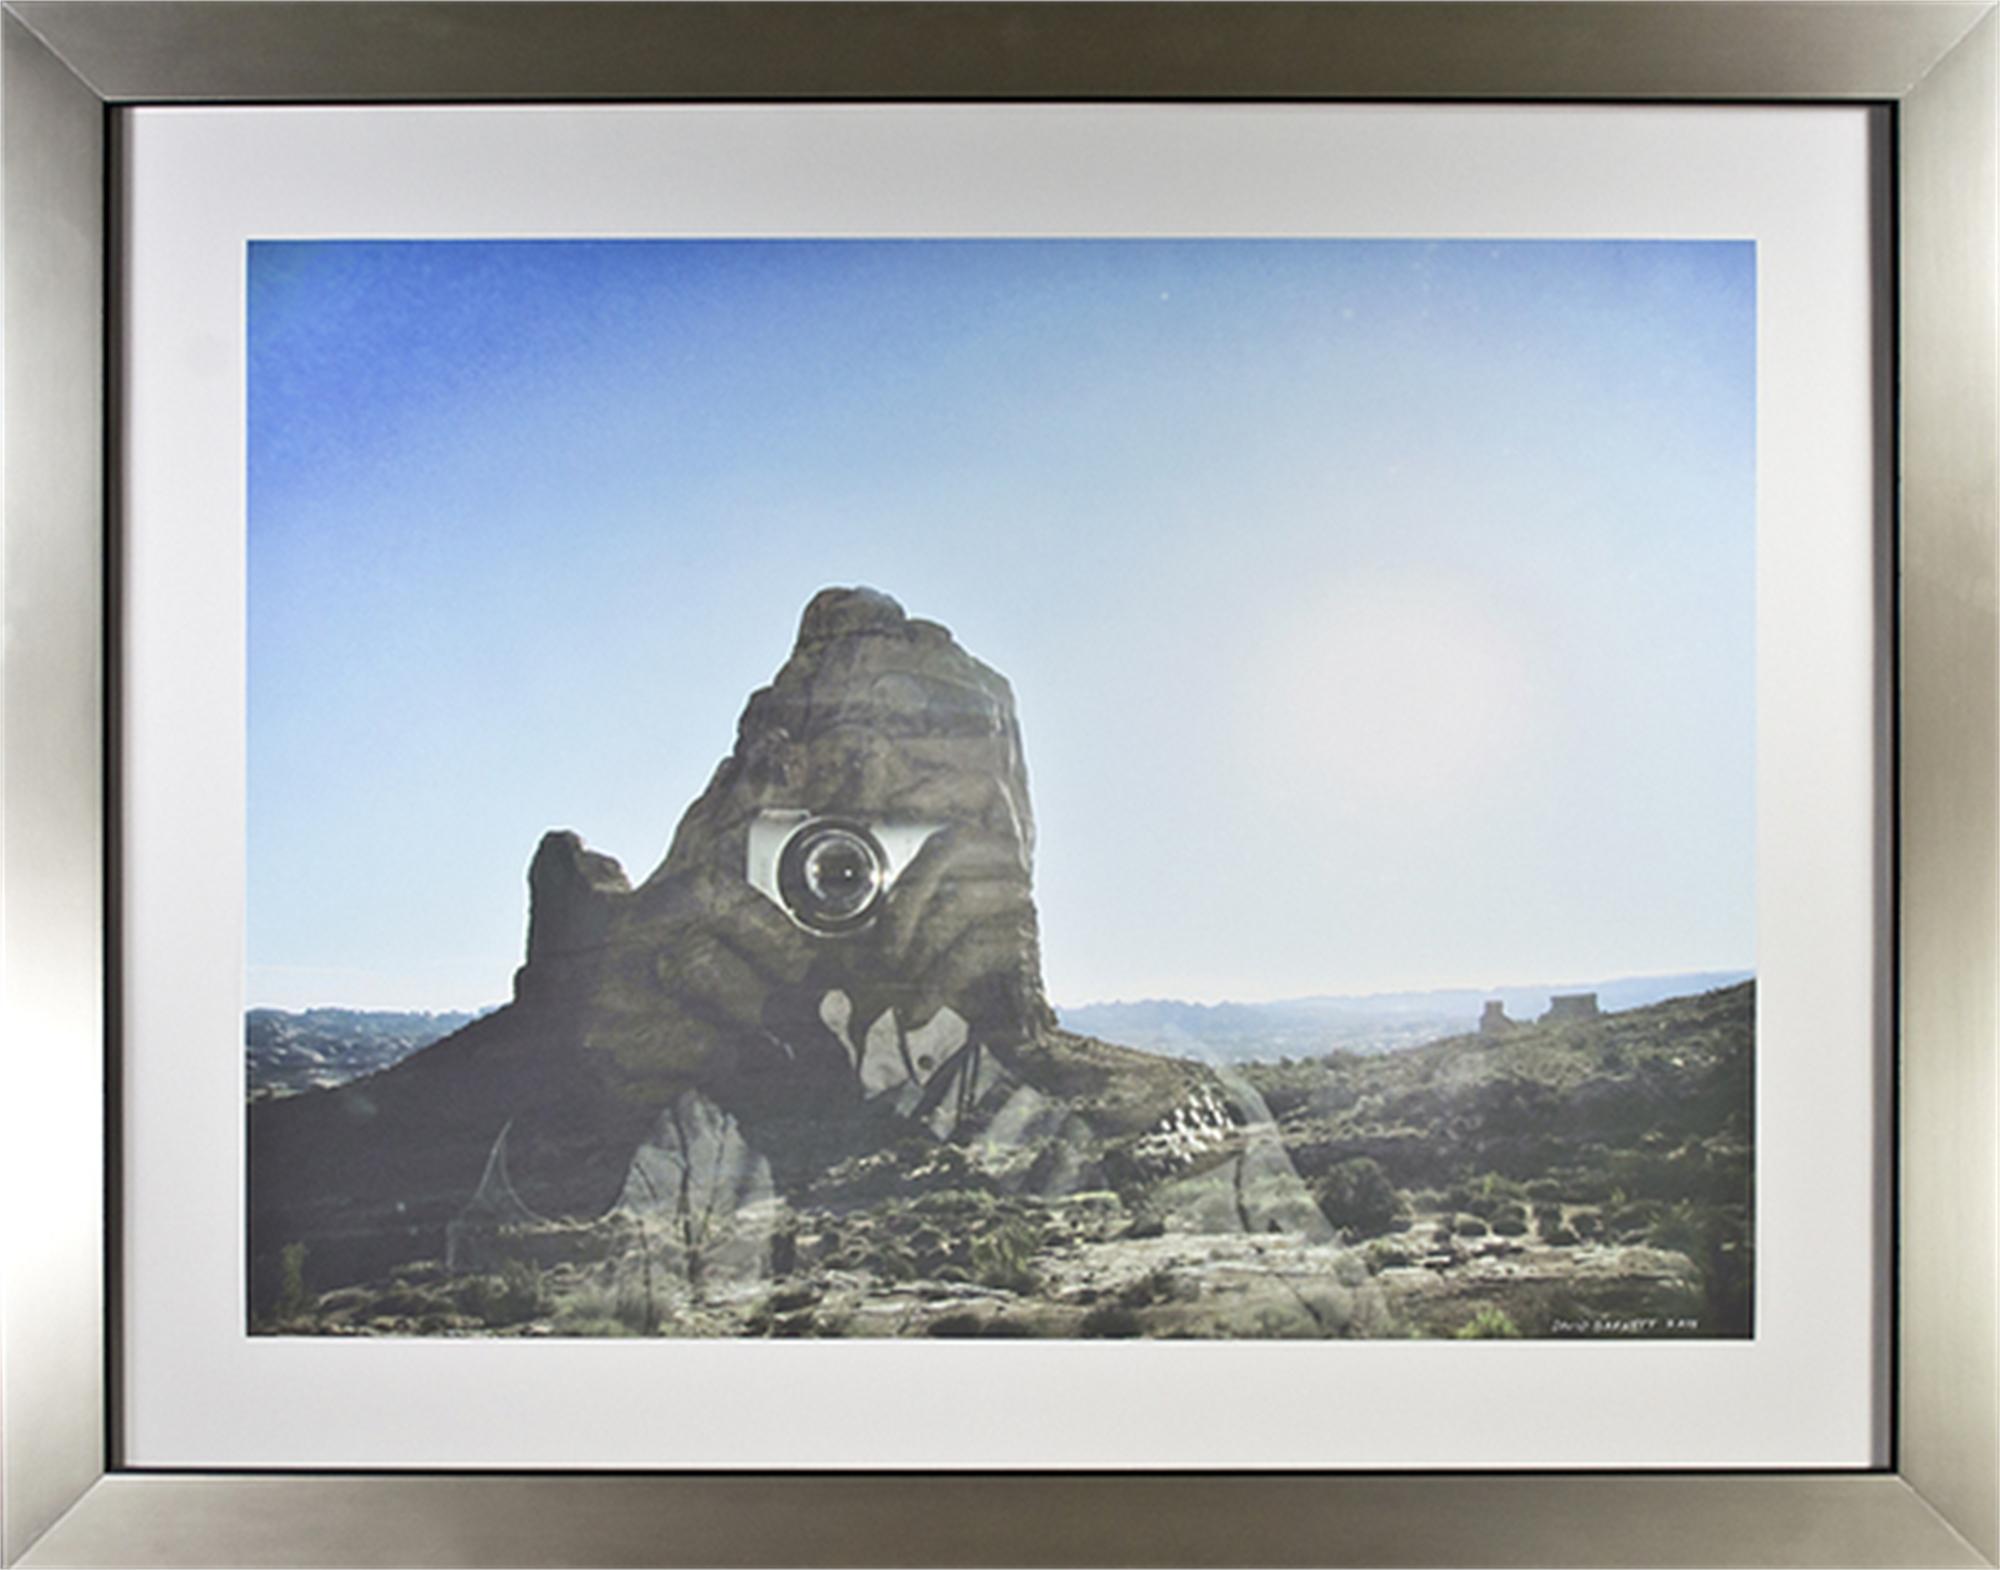 Surreal Reflection - Arches National Park, Moab, Utah by David Barnett